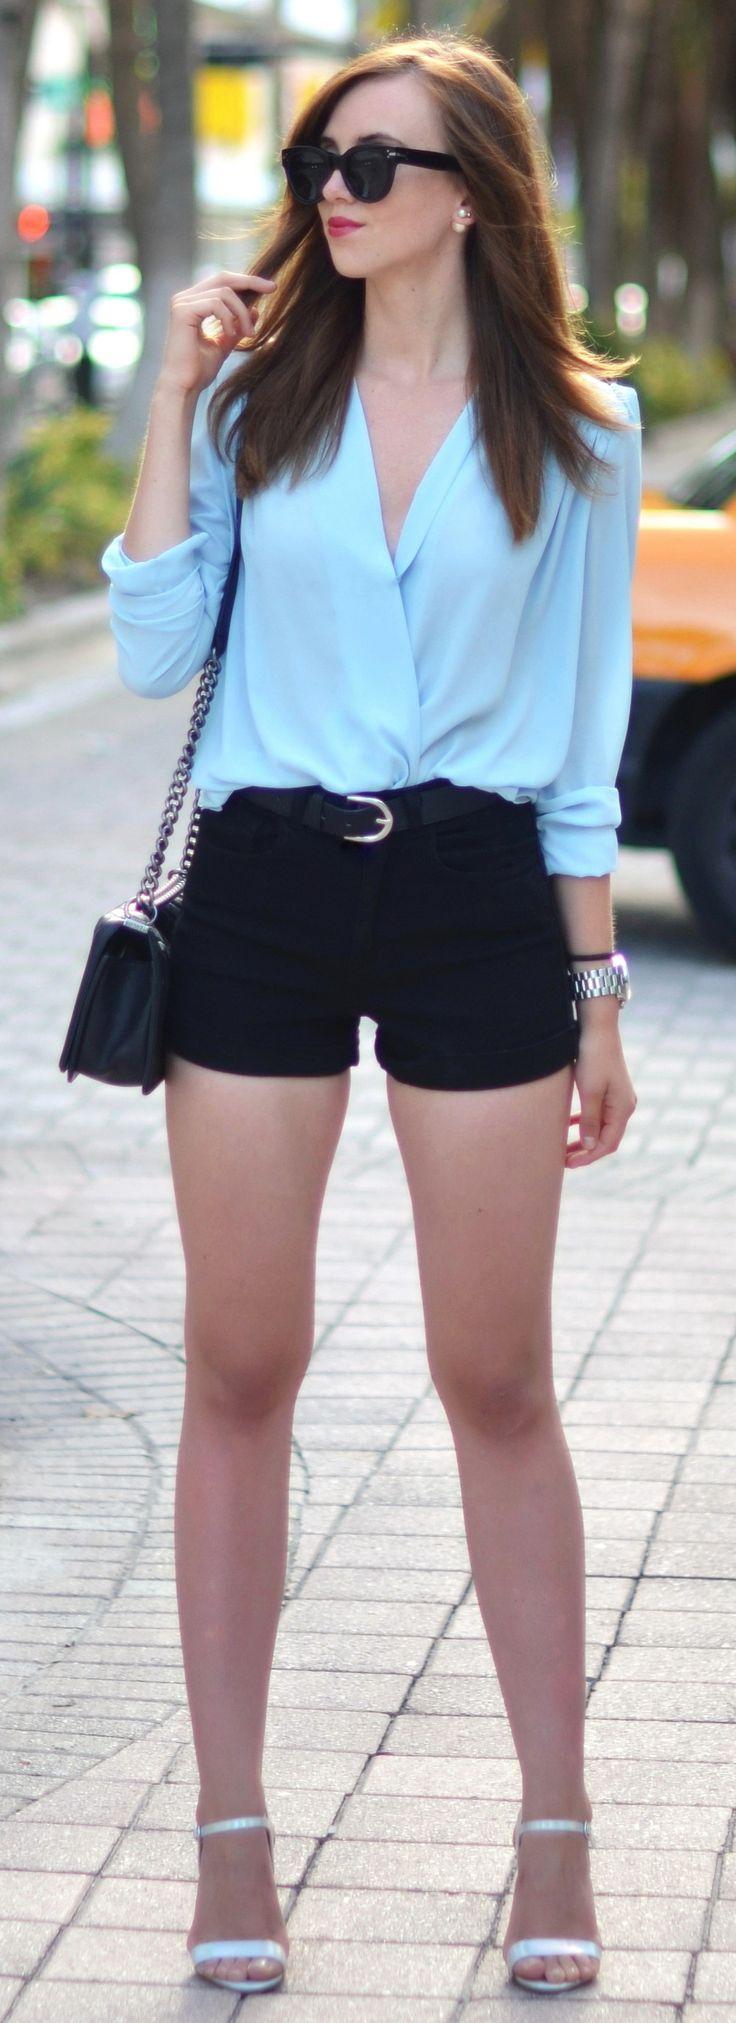 TFNC blouse via Edited // American Apparel shorts // Asos sandals // Chanel bag